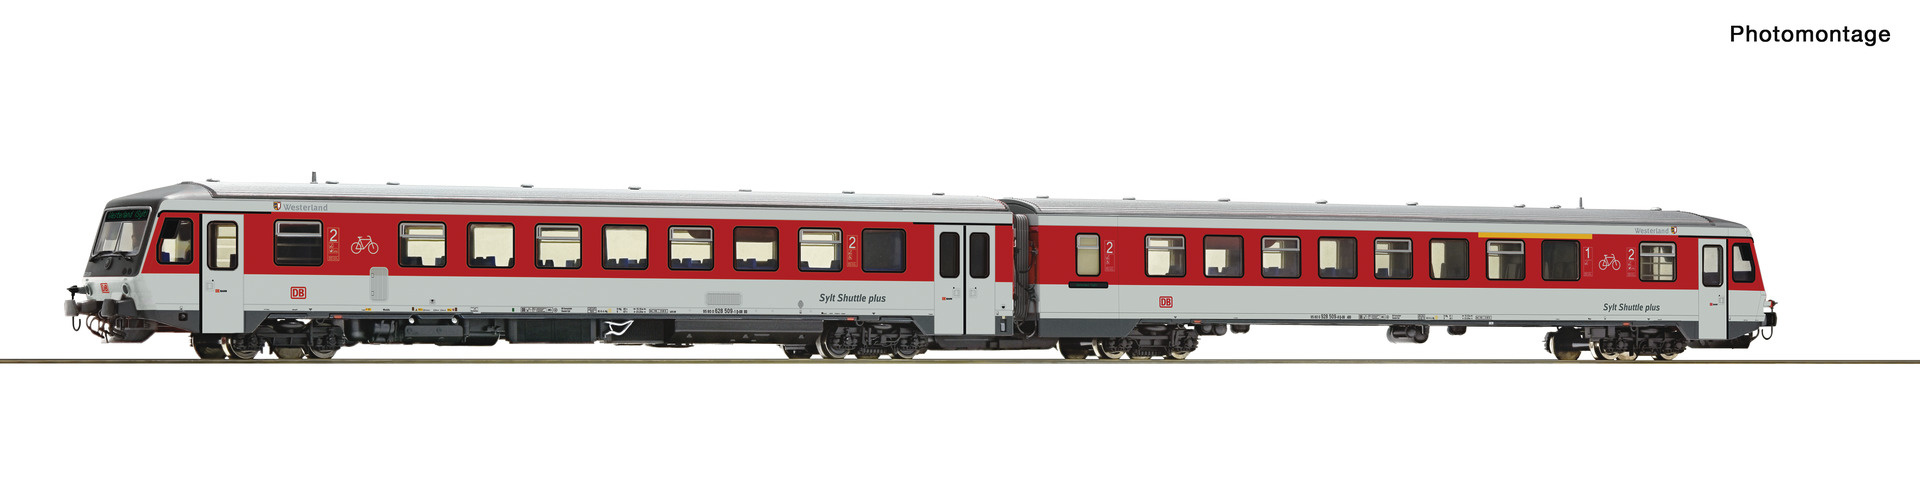 72070 Dieseltriebzug BR628.4 Sylt-1